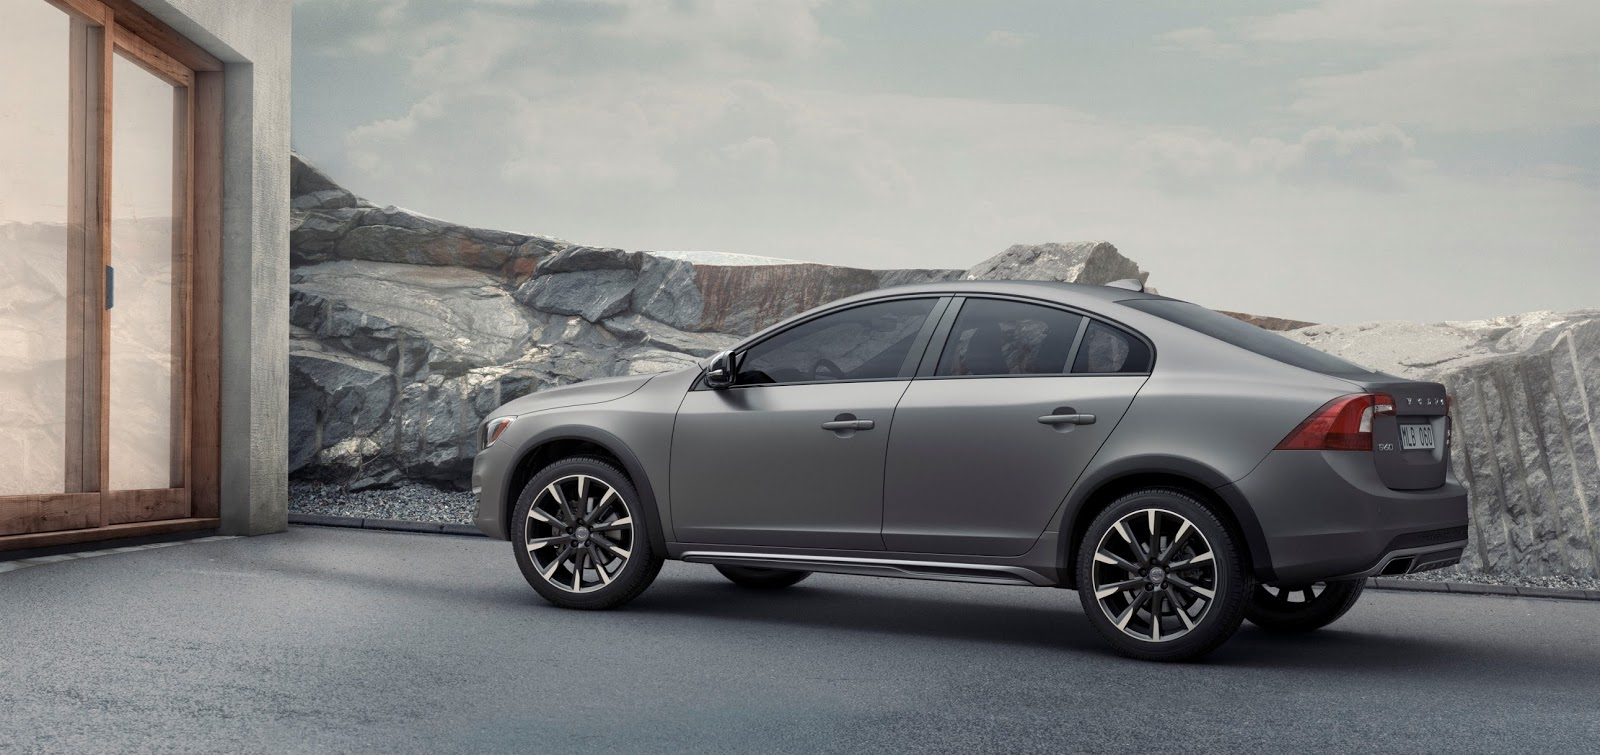 VOLVO%2BS60%2BCROSS%2BCOUNTRY%2B2 Η Volvo με το νέο S60 Cross Country δημιουργεί το πρώτο sedan με διττό χαρακτήρα